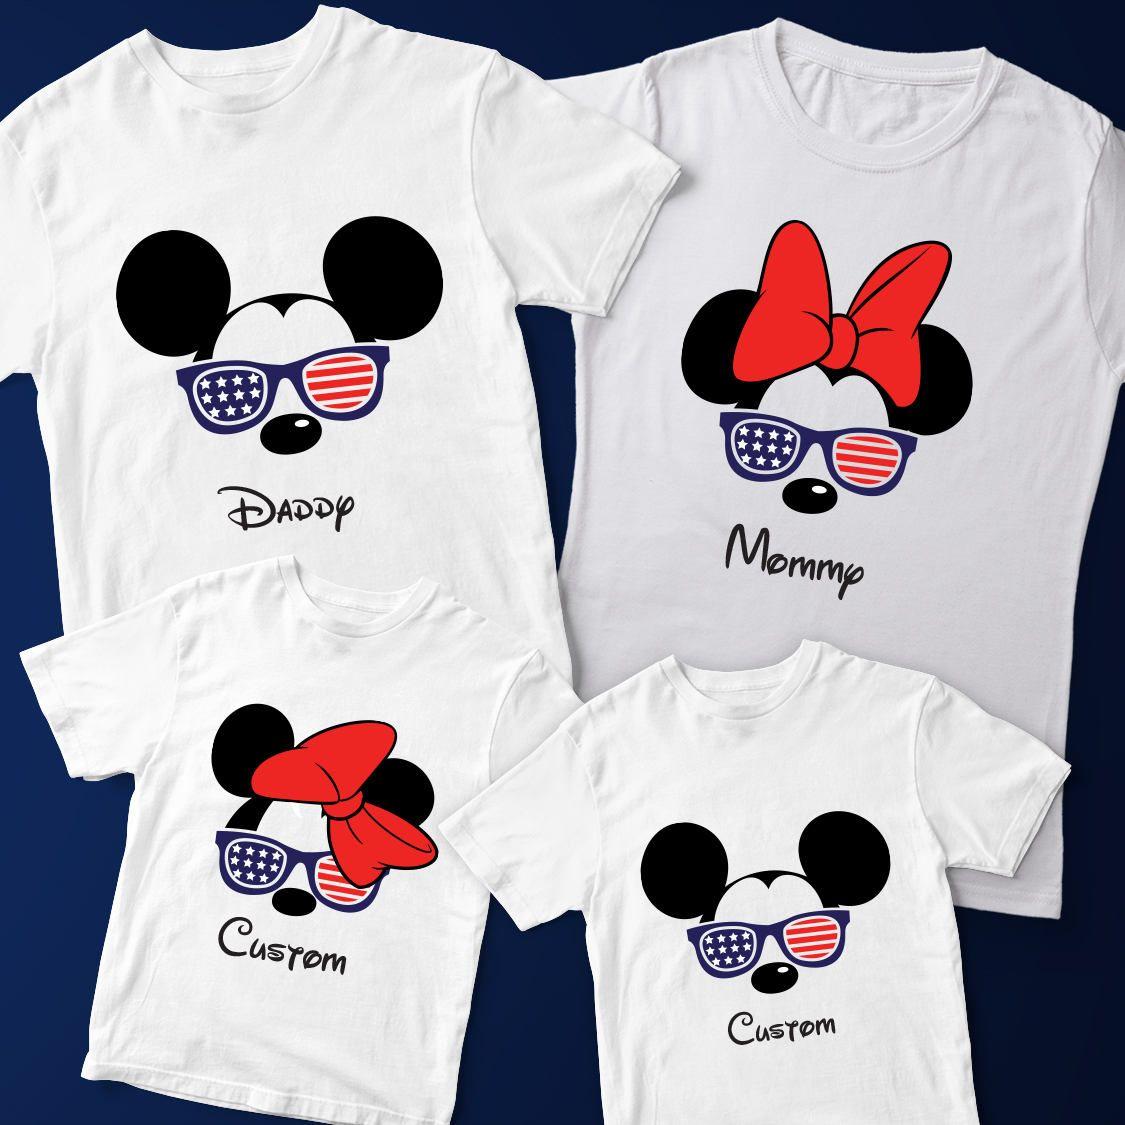 Free Shipping!! Disney Mickey Mouse Personalized Unisex Raglan / Disney Shirts / Disney Raglans / Dad Disney Shirts / Disney Grandpa Shirts 94t05